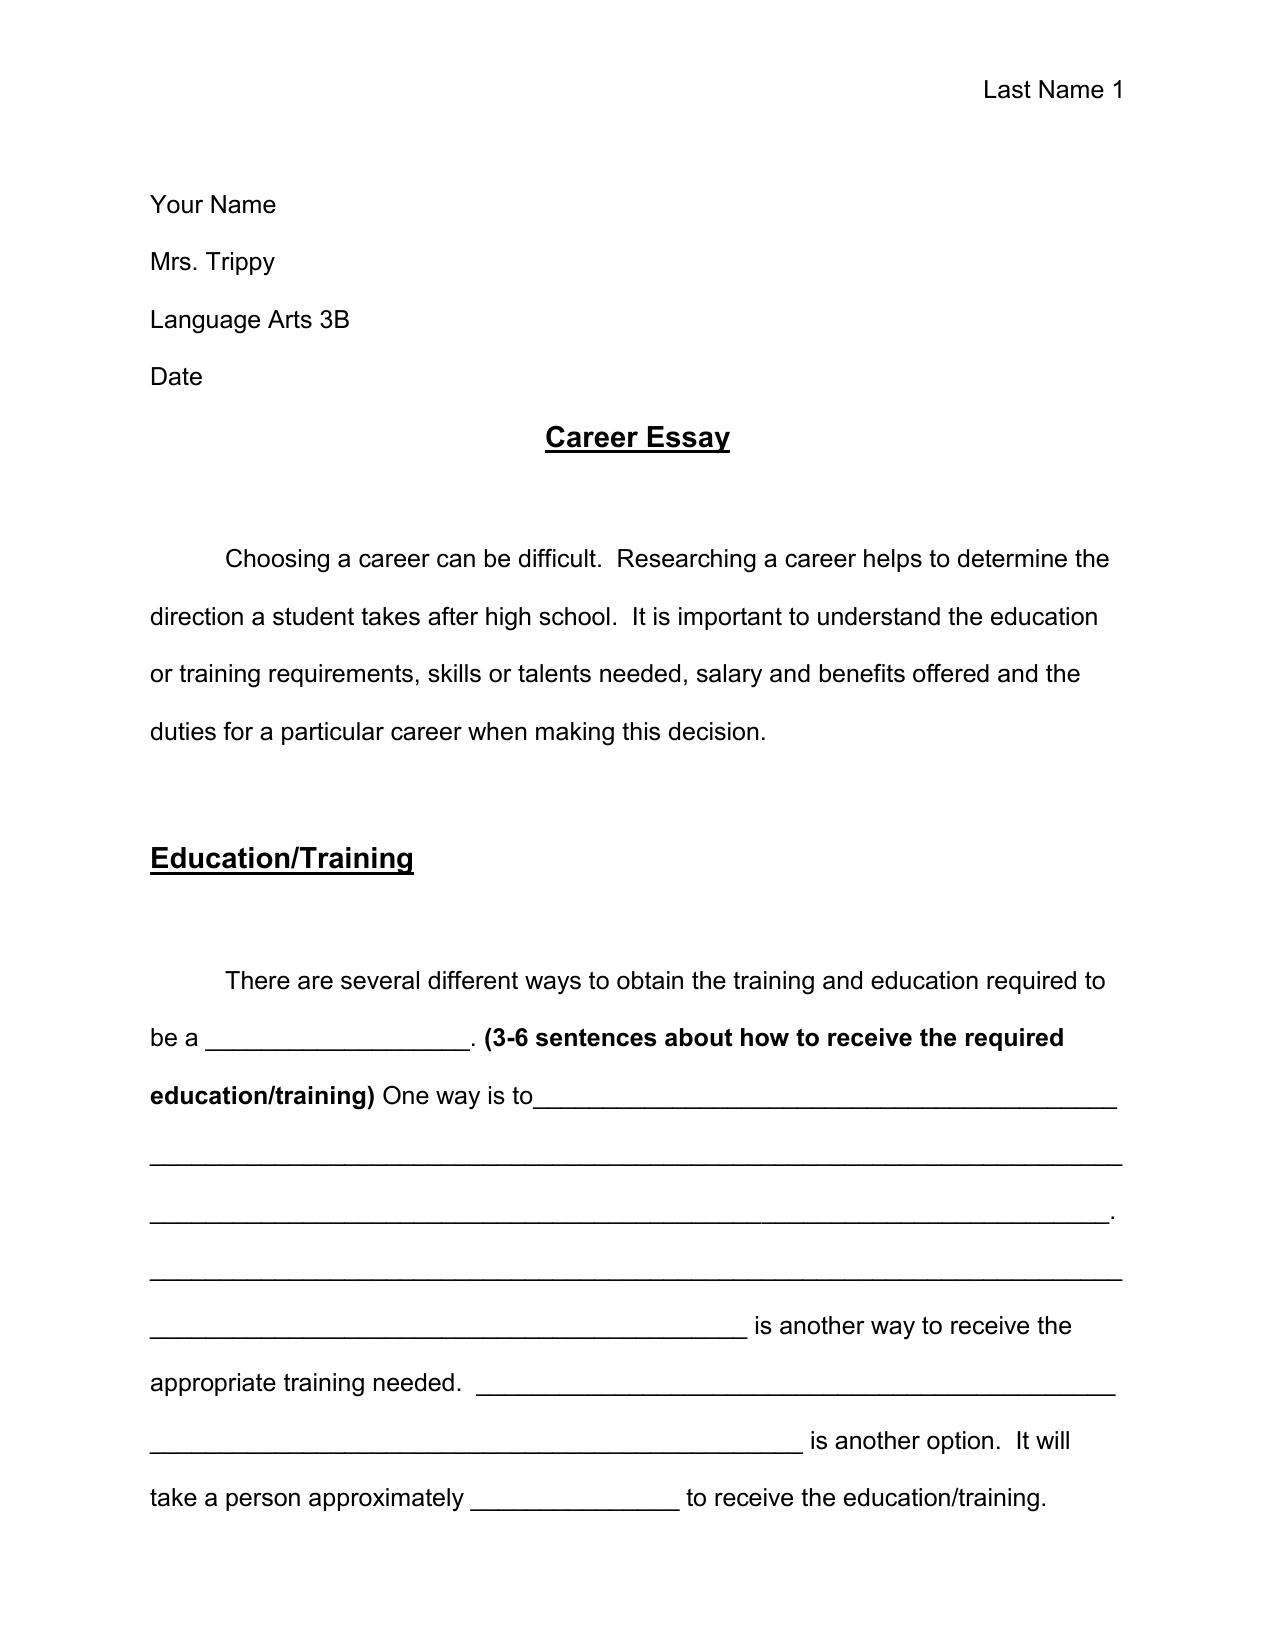 Career Essay Outline Essay Outline Paper Writing Service Essay